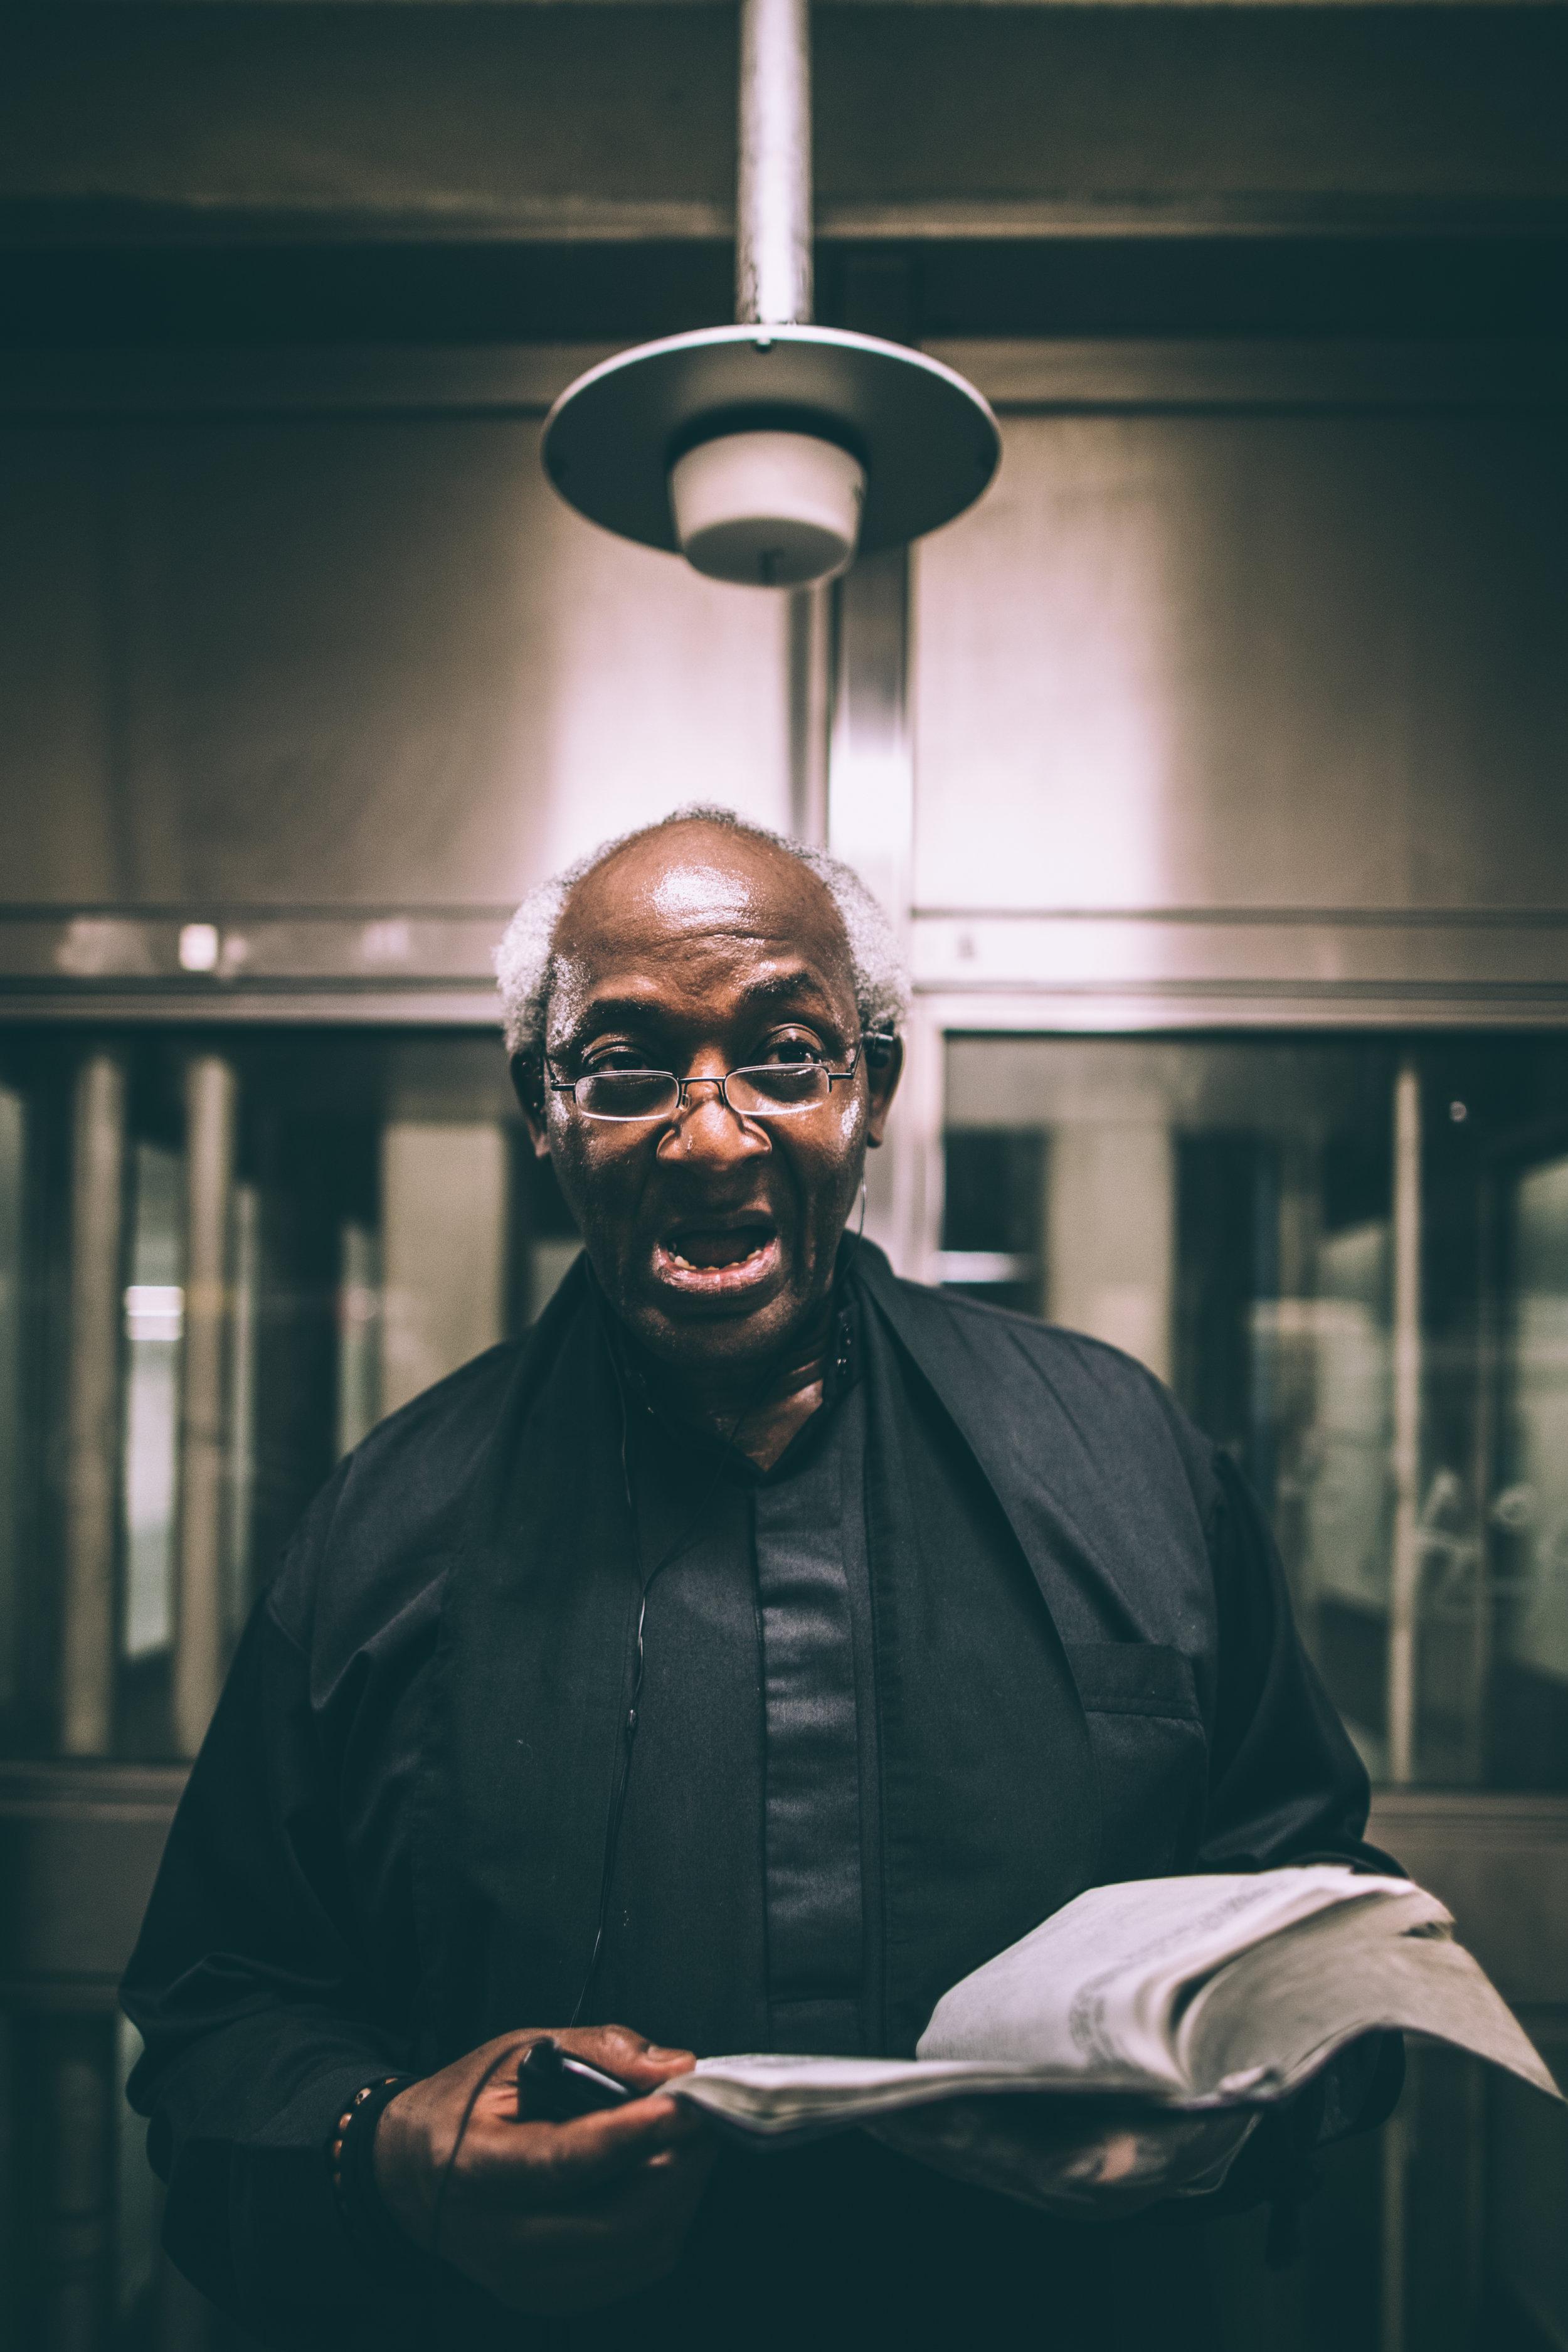 PREACHER MAN -- NYC SUBWAY 2017 / ORGNZD VISUALS BY LEXANDER BRYANT